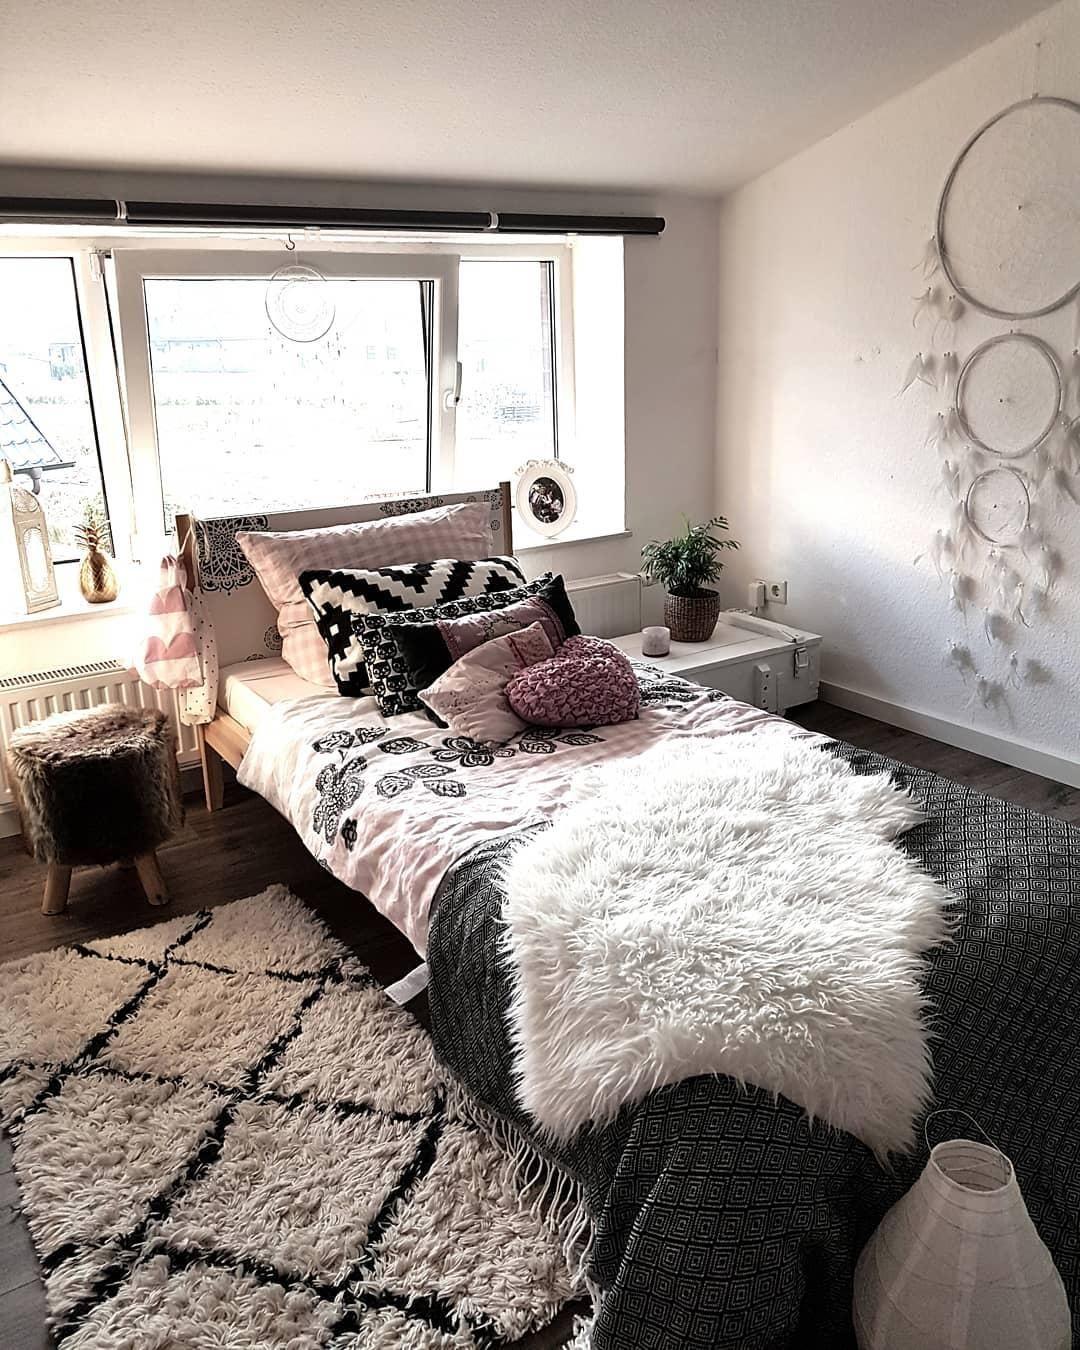 Full Size of Schaffell Carry Schlafzimmer Bett Günstig Landhausstil Wandleuchte Wiemann Wohnzimmer Teppiche Günstige Komplett Set Eckschrank Rauch Schranksysteme Truhe Schlafzimmer Teppich Schlafzimmer